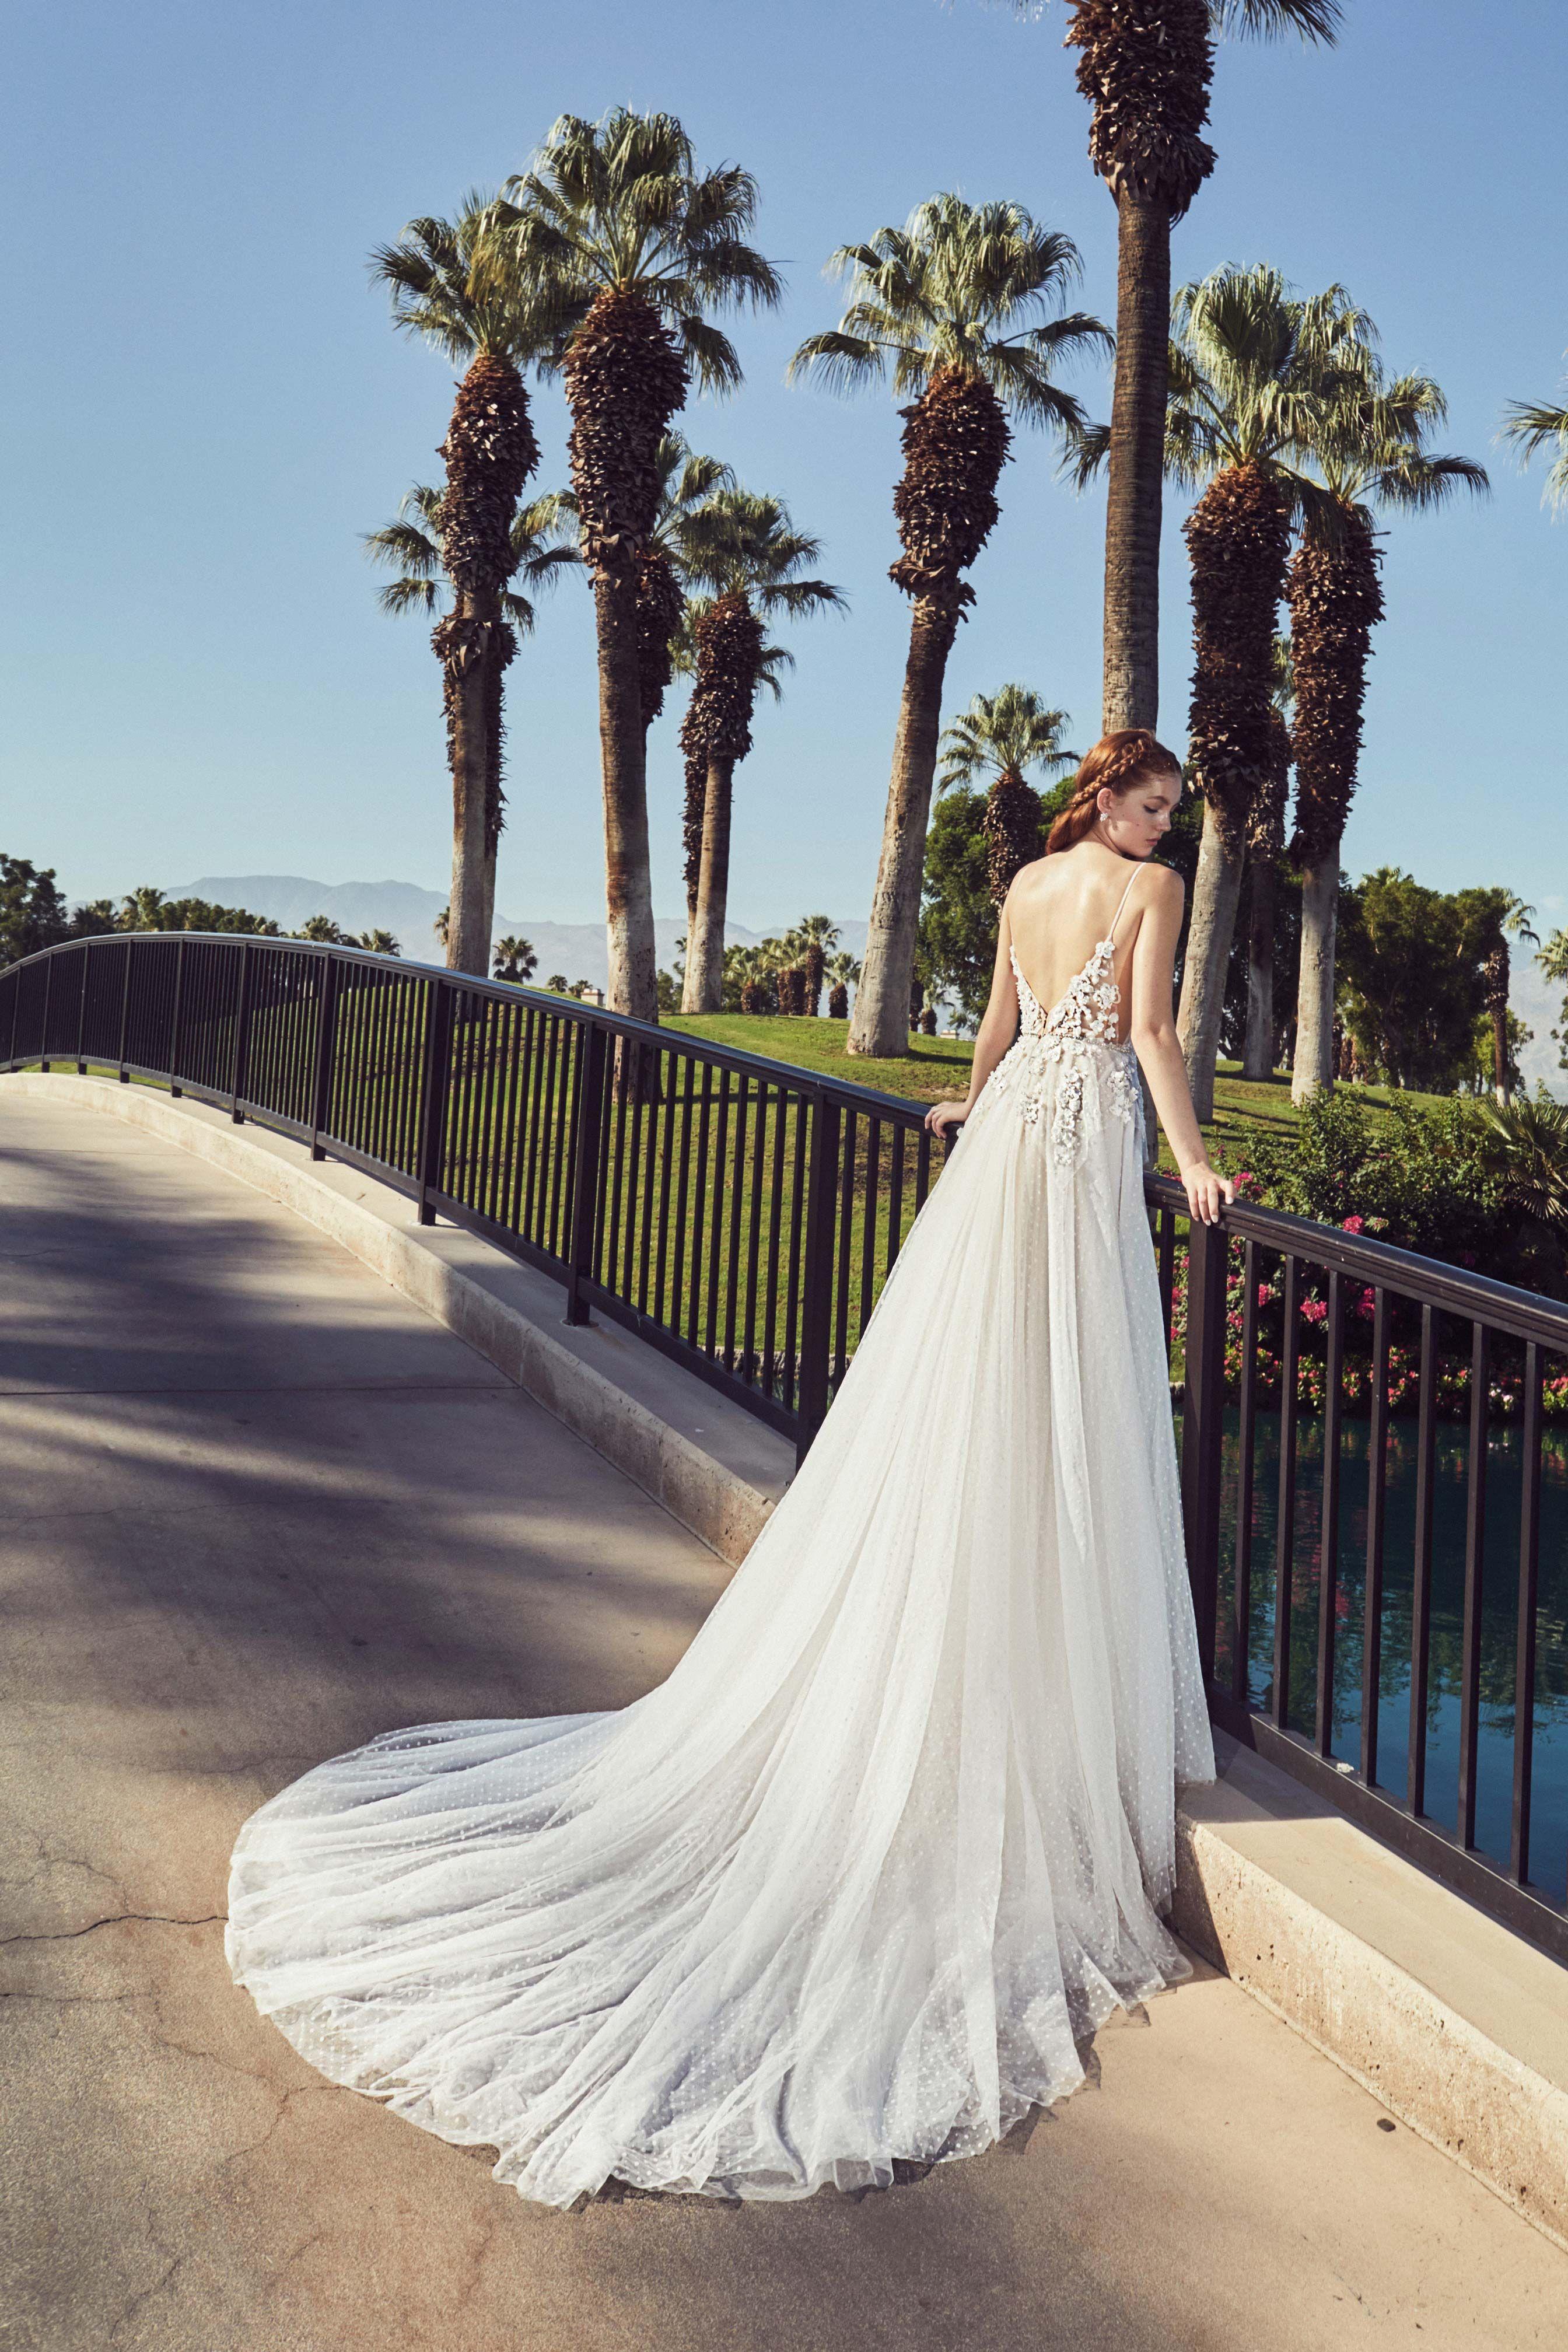 How To Get A Free Wedding Dress